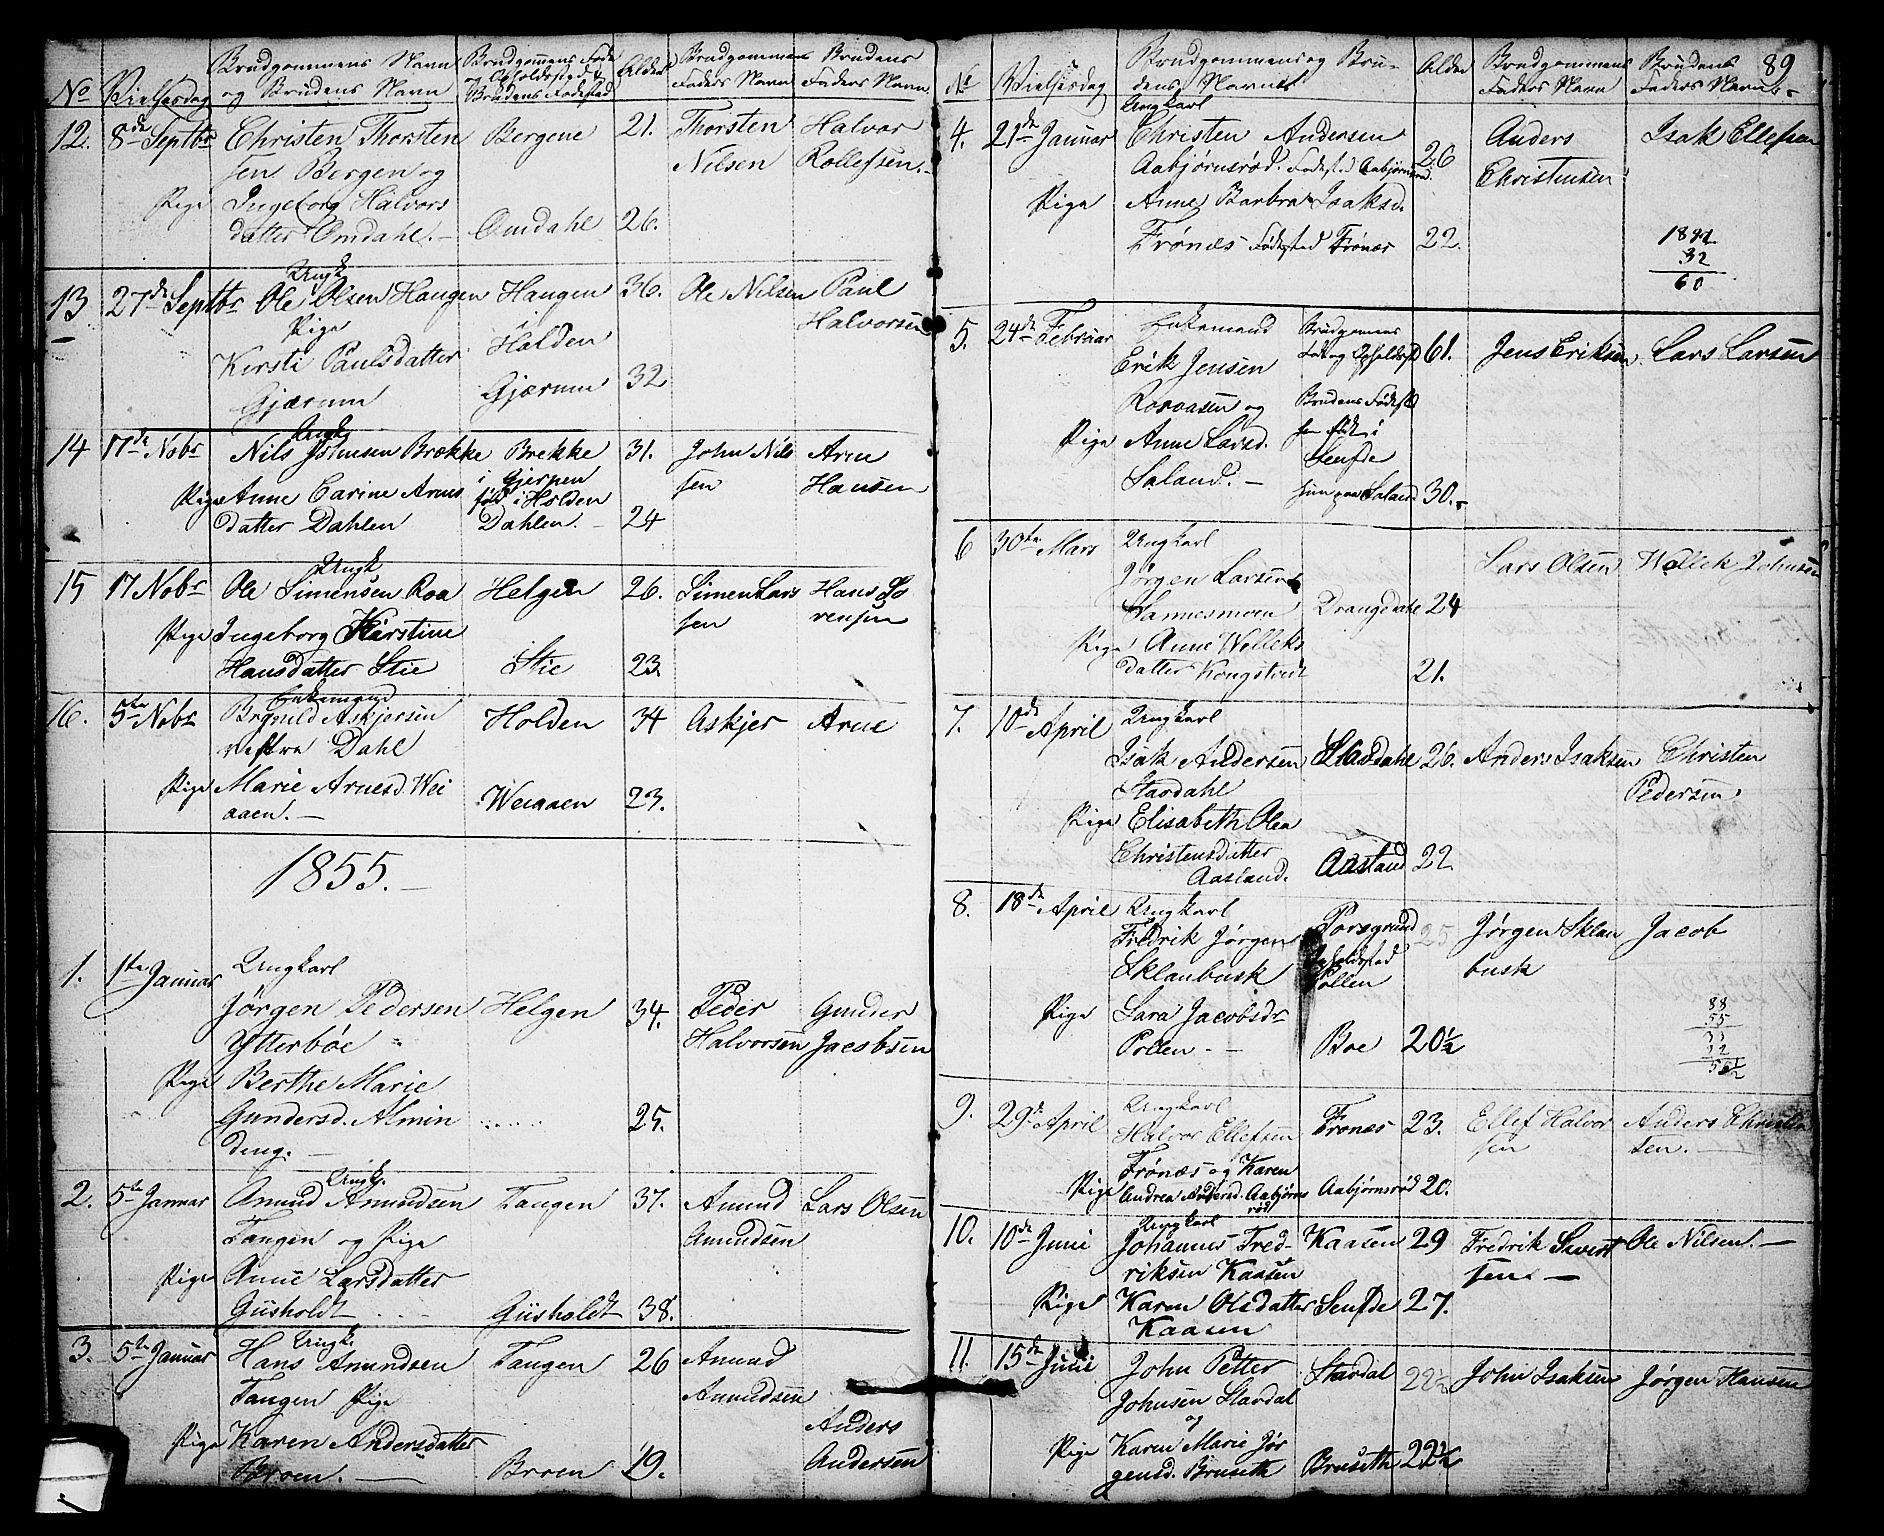 SAKO, Solum kirkebøker, G/Gb/L0001: Klokkerbok nr. II 1, 1848-1859, s. 89